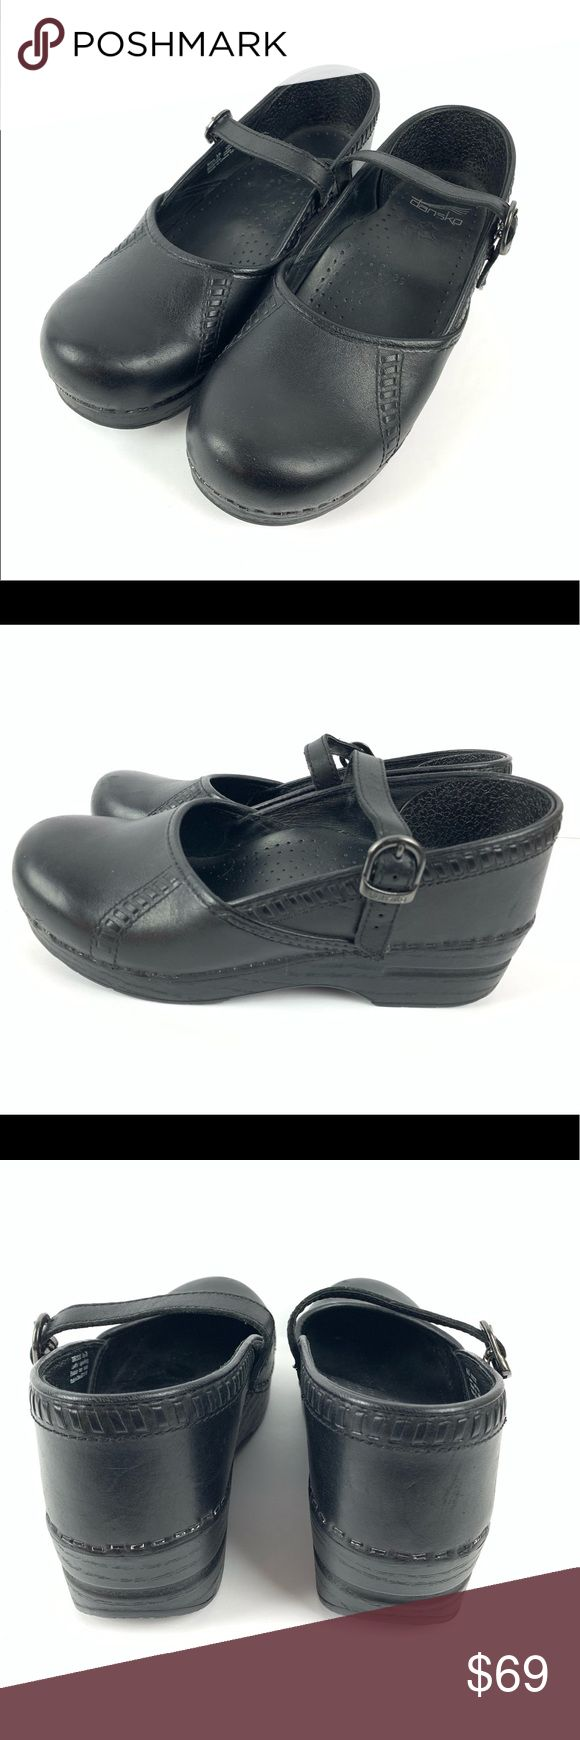 ☮️ Dansko Marcelle cabrio leather Maryjane size 39 Dansko Clogs Marcelle Bla…